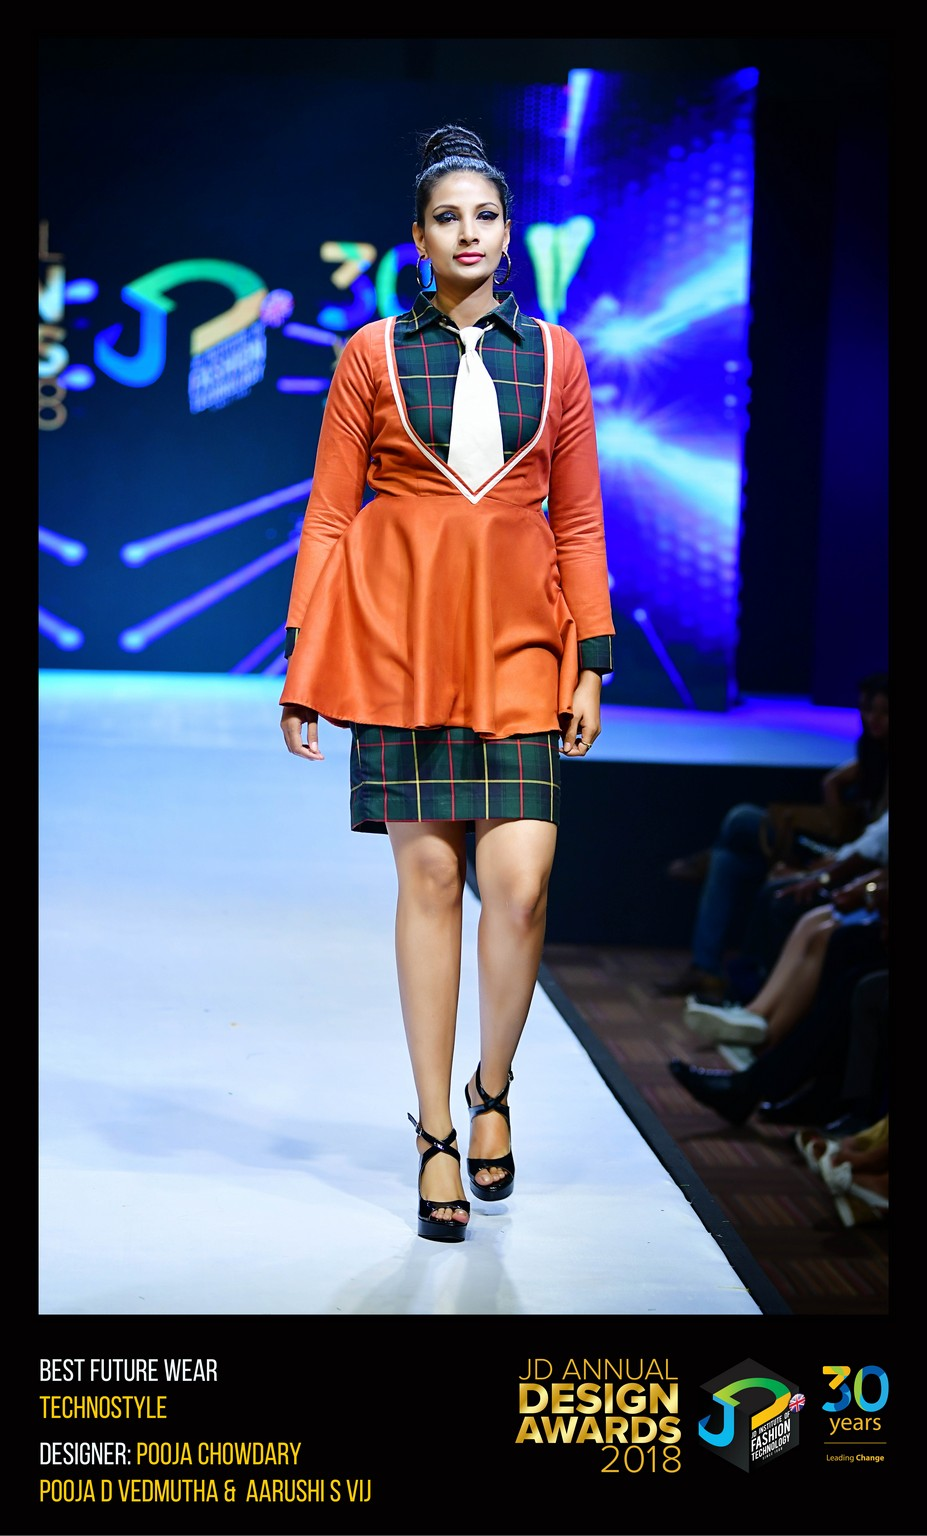 Techno style – Change – JD Annual Design Awards 2018 | Designer: M. Pooja, Pooja.D | Photography : Jerin Nath (@jerin_nath) techno style - Technostyle2 - Techno style – Change – JD Annual Design Awards 2018